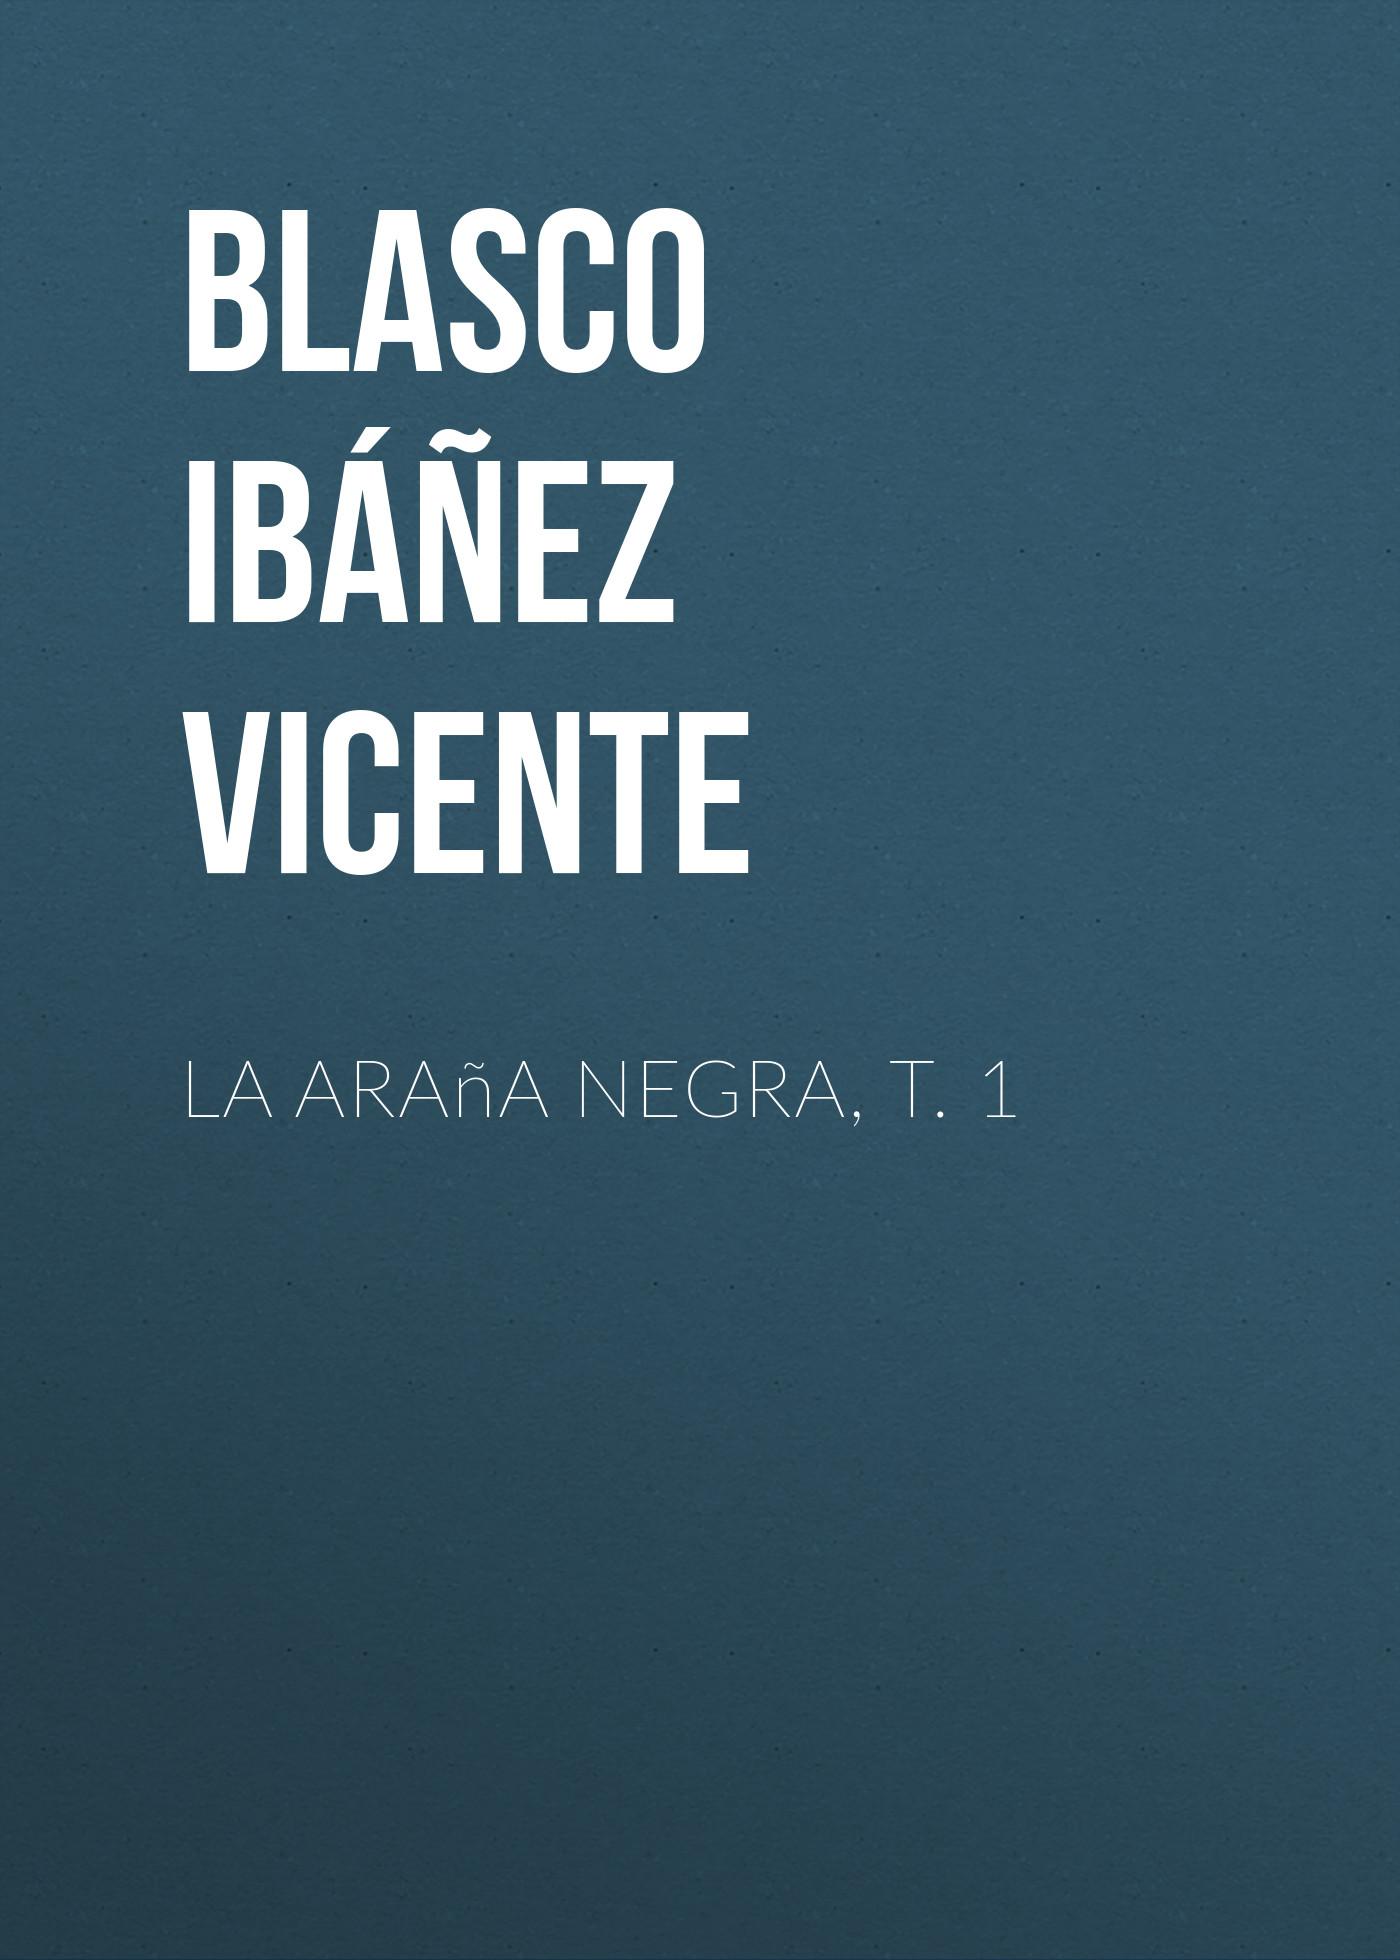 Blasco Ibáñez Vicente La araña negra, t. 1 blasco ibáñez vicente la araña negra t 1